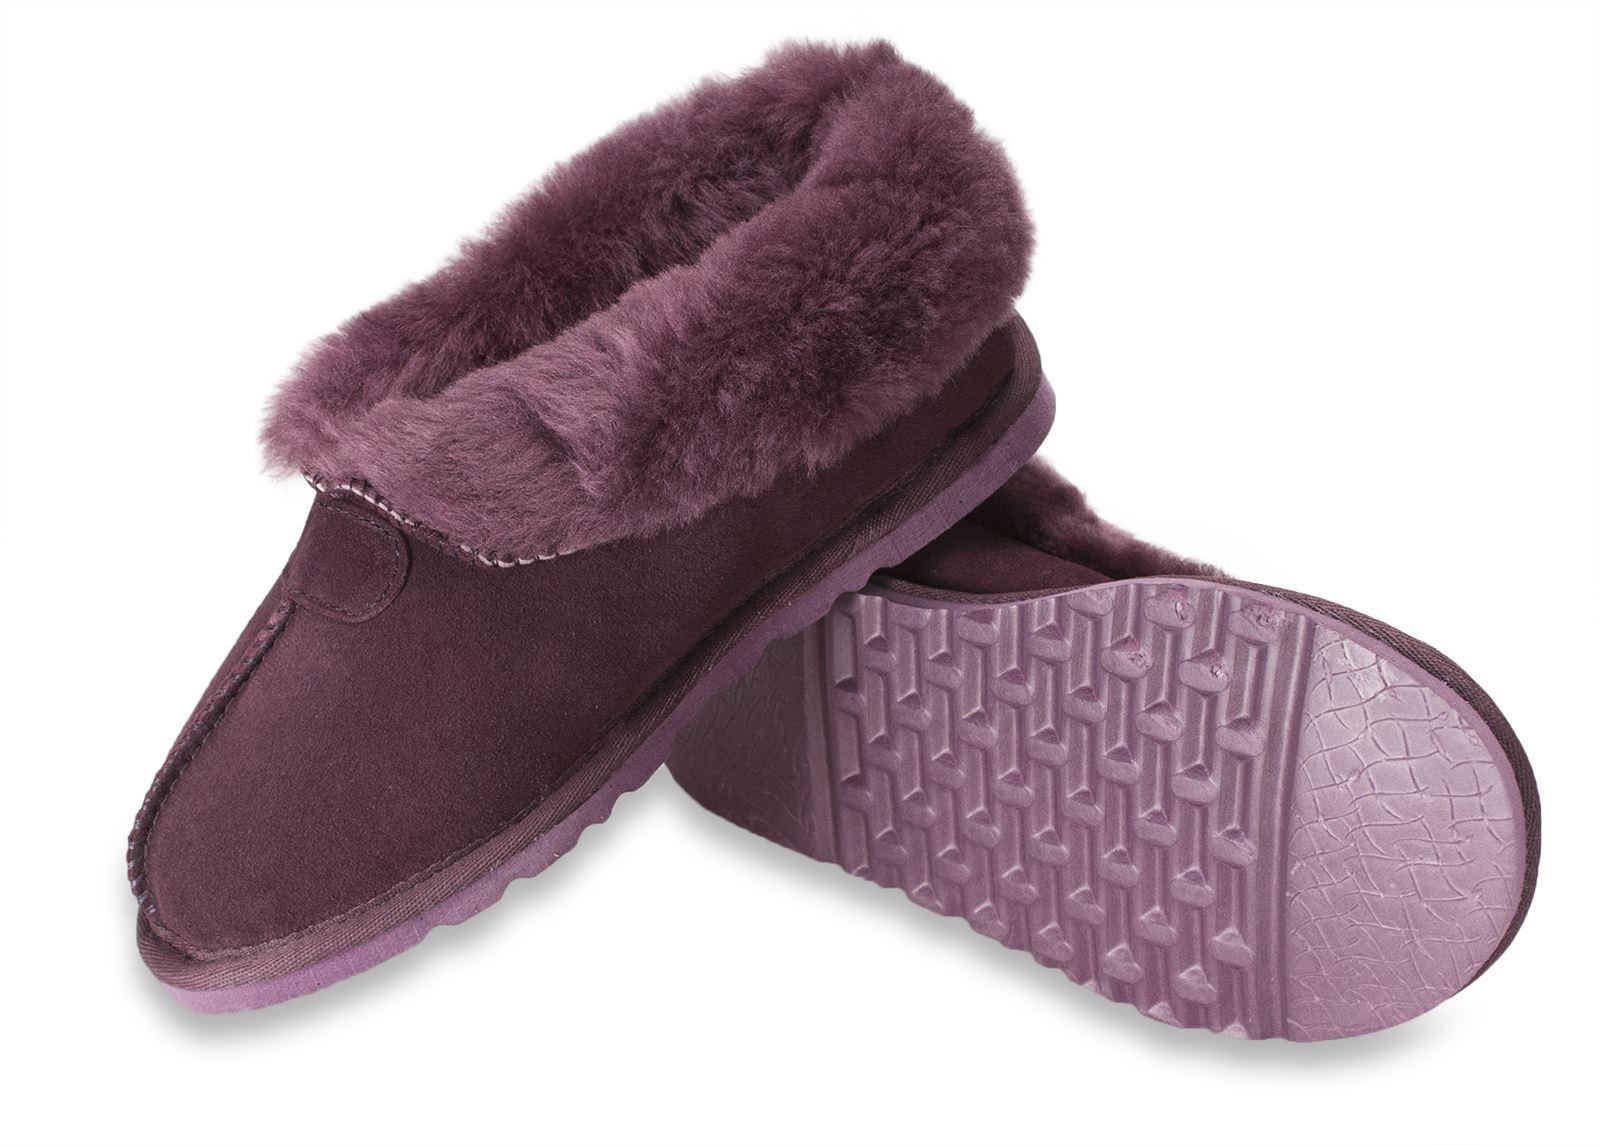 Women's Cozy Memory Foam Slippers Fuzzy Wool-Like Plush Fleece Lined House Shoes w/Indoor, Outdoor Anti-Skid Rubber Sole by ULTRAIDEAS $ - $ $ 19 90 - $ 21 99 Prime.